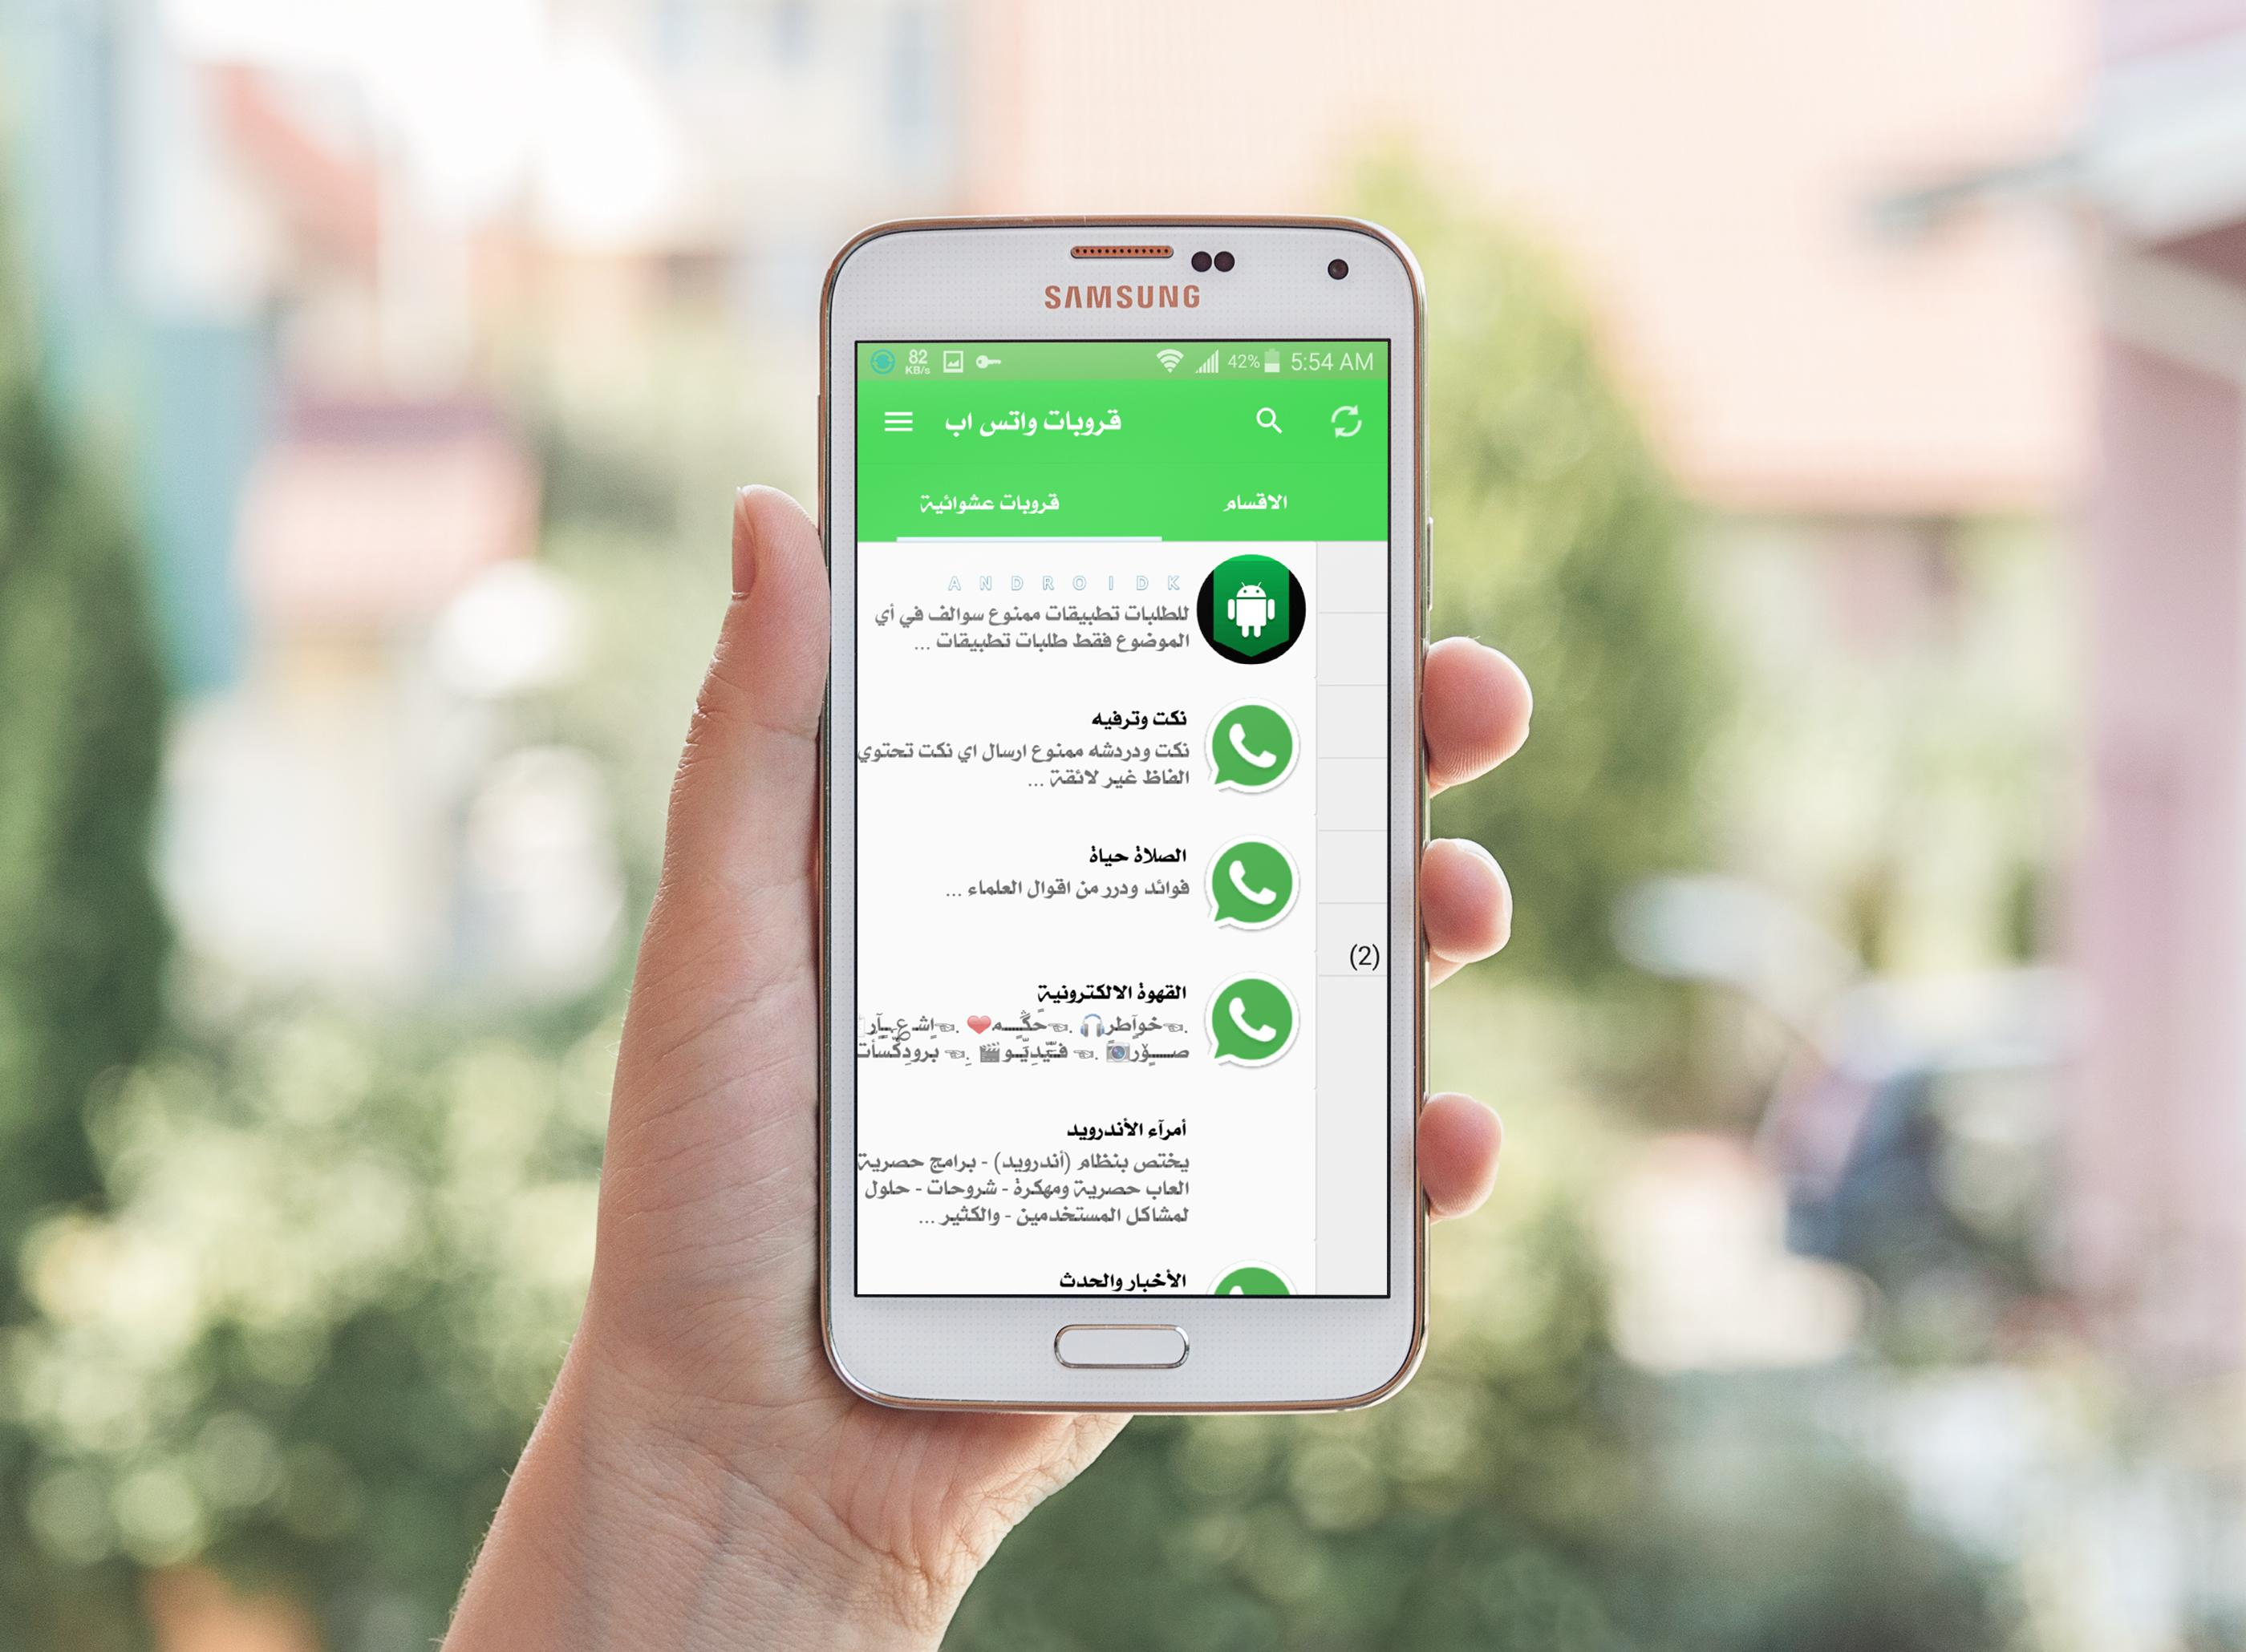 قروبات واتس اب للتعارف For Android Apk Download